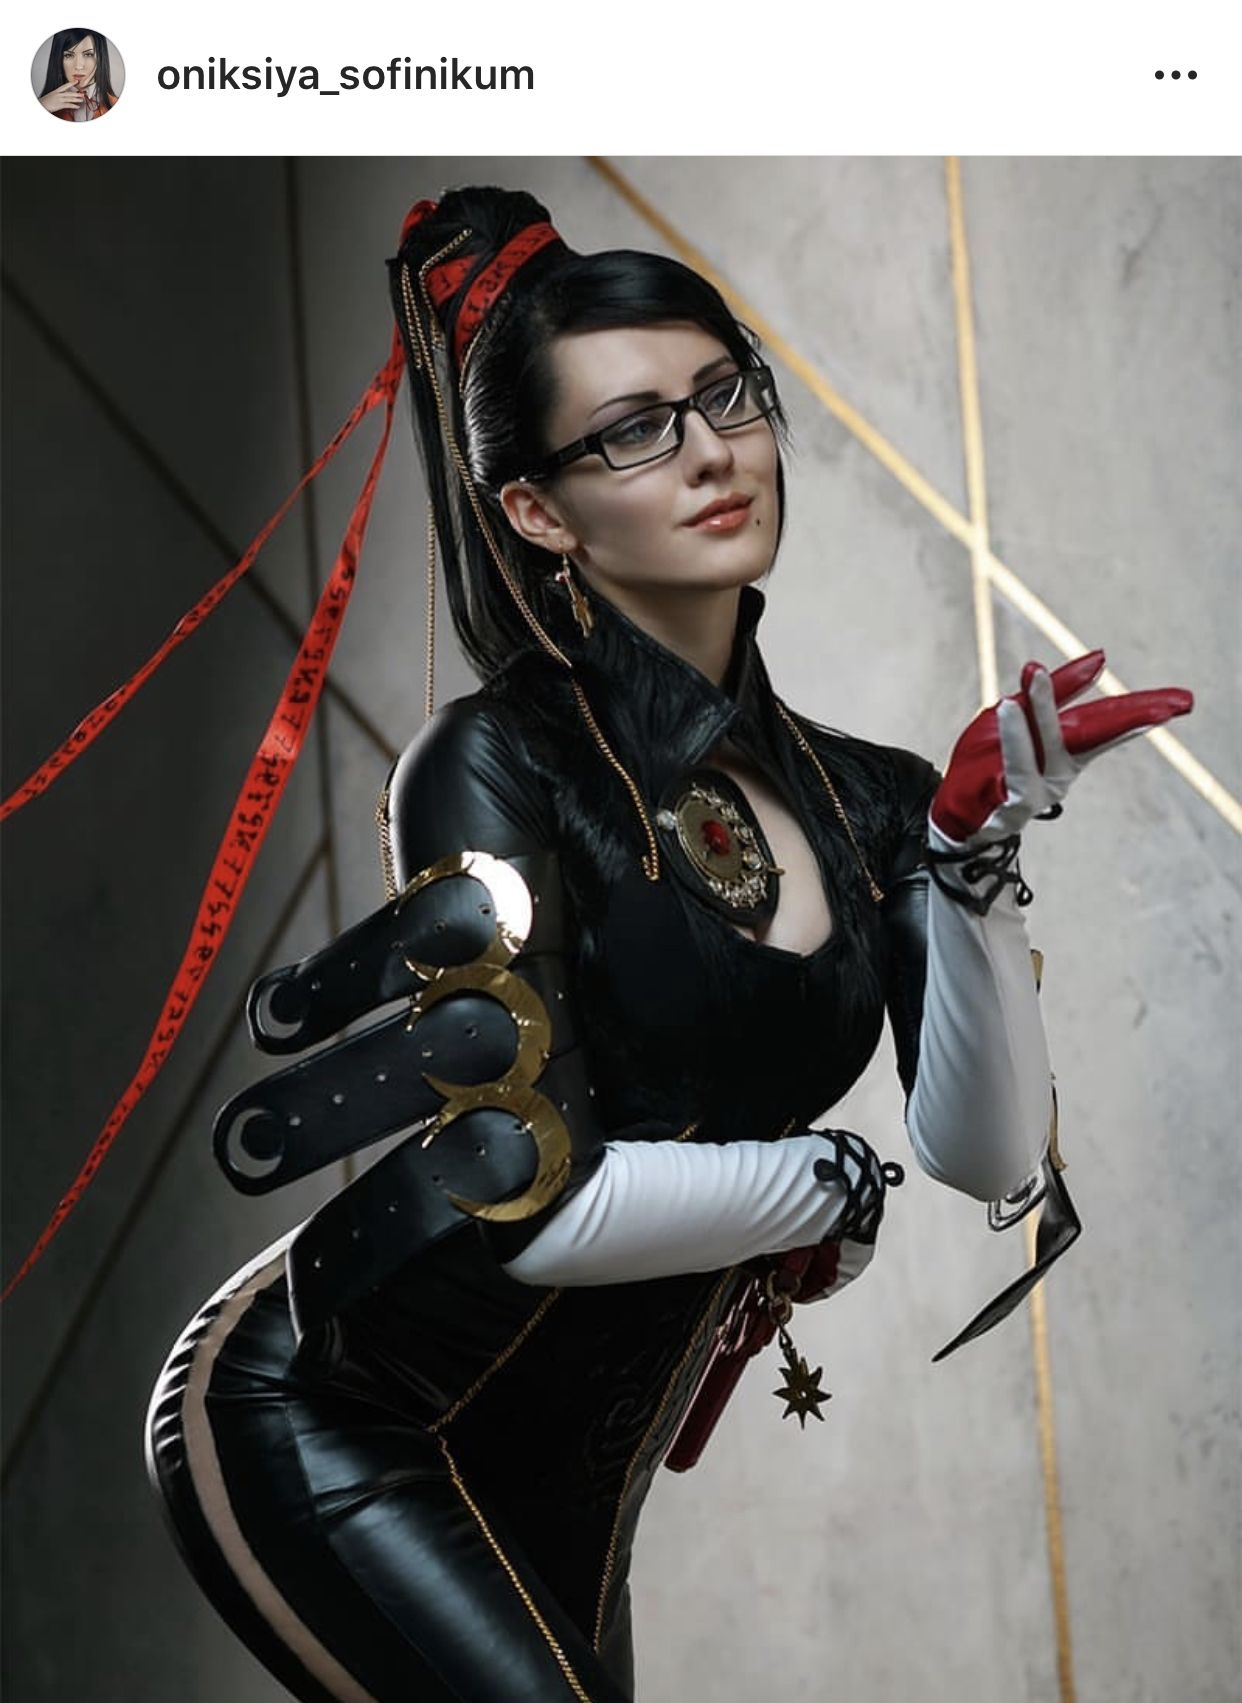 Bayonetta | Bayonetta, Cosplay woman, Best cosplay